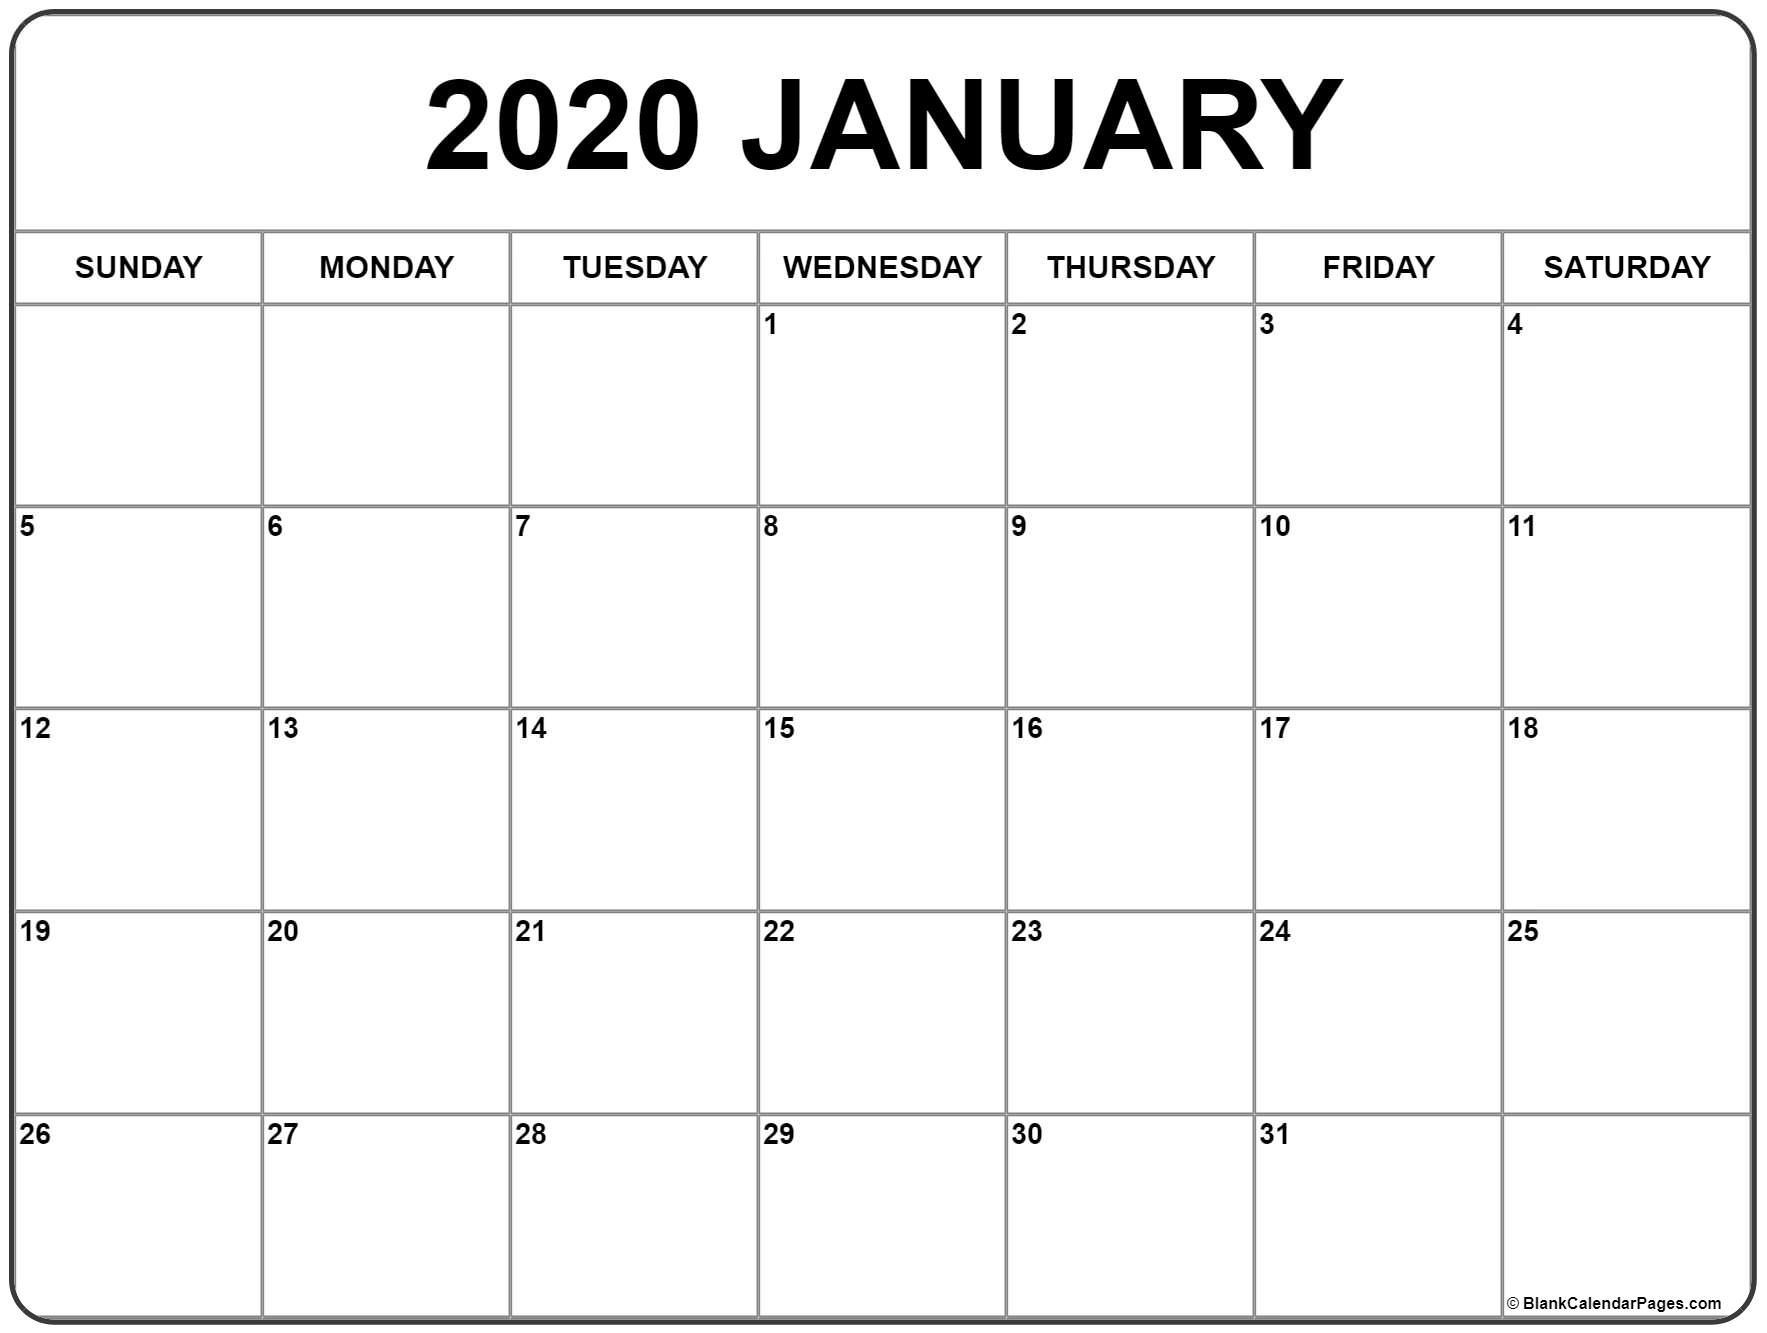 January 2020 Calendar | Free Printable Monthly Calendars-January 2020 Calendar Dates